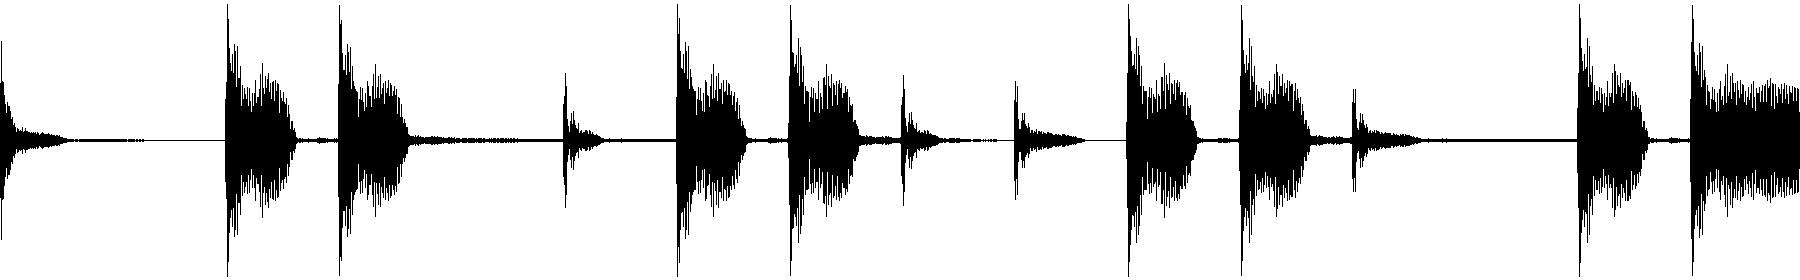 g abs05 006